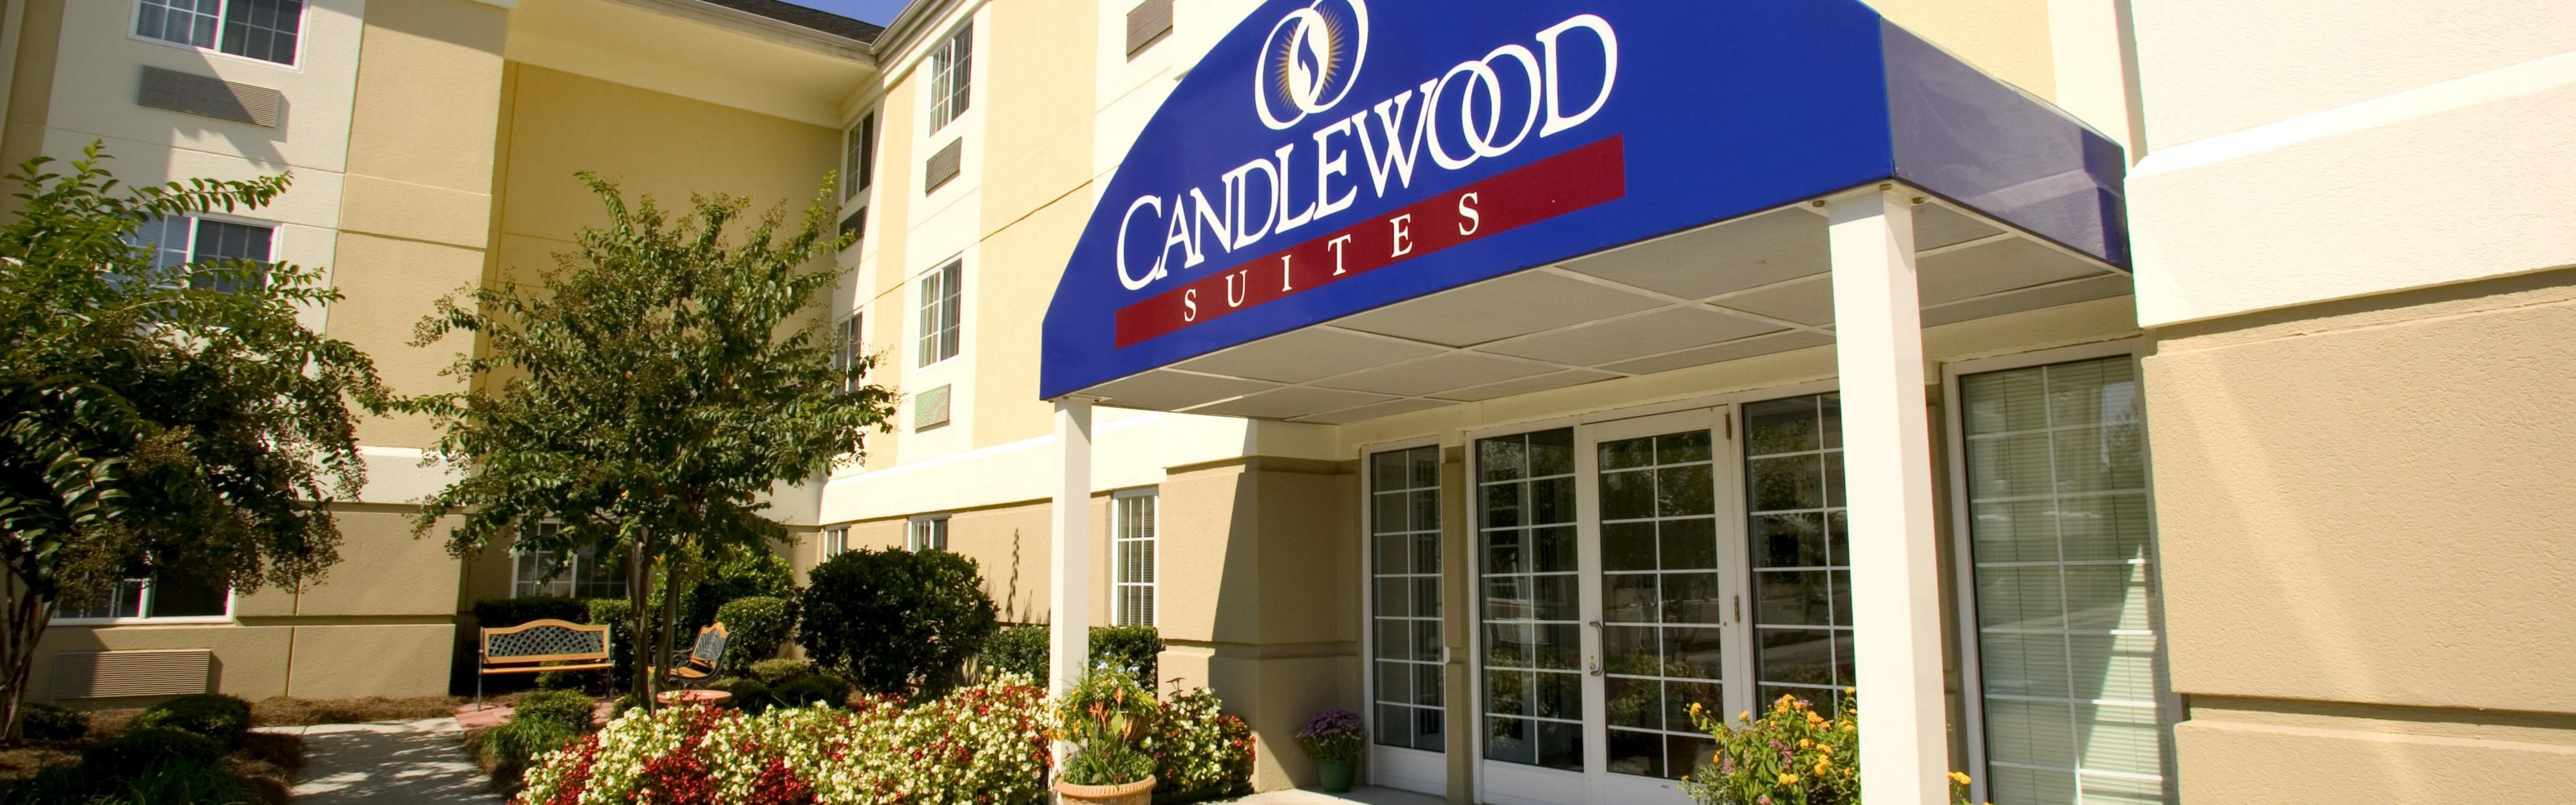 Candlewood Suites Atlanta image 0